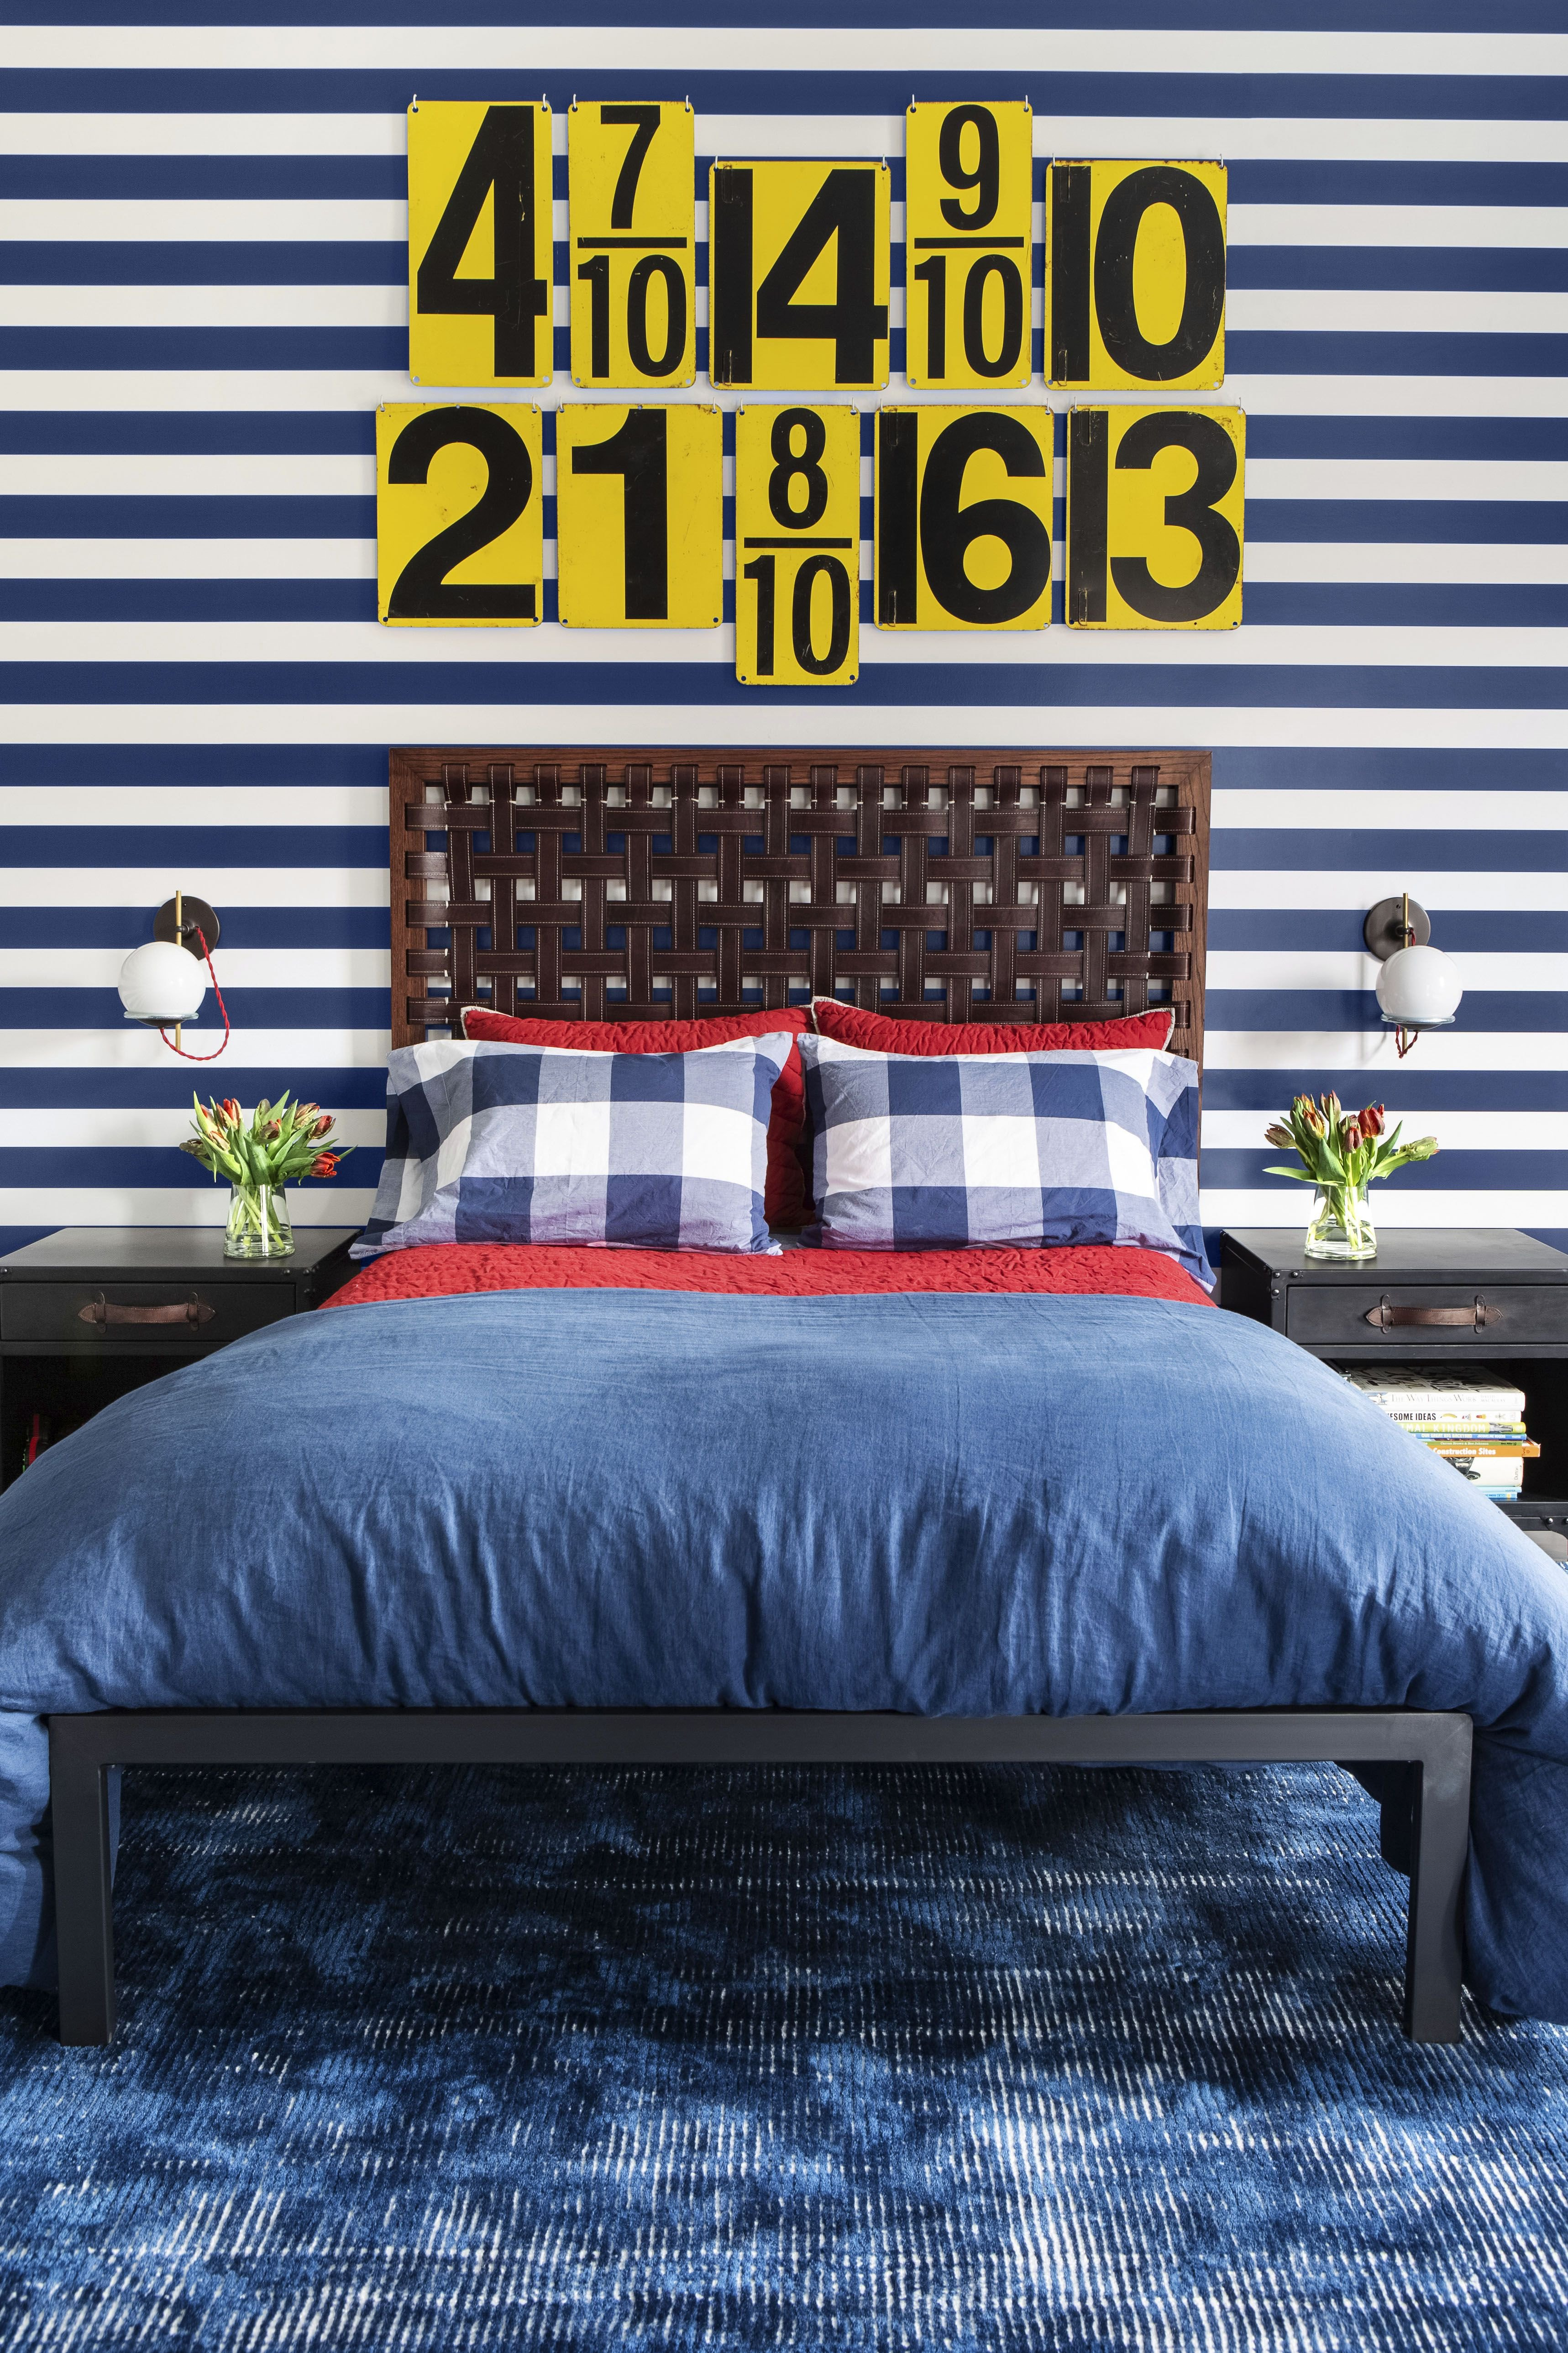 Teal and Black Bedroom Ideas Fresh 30 Best Kids Room Ideas Diy Boys and Girls Bedroom